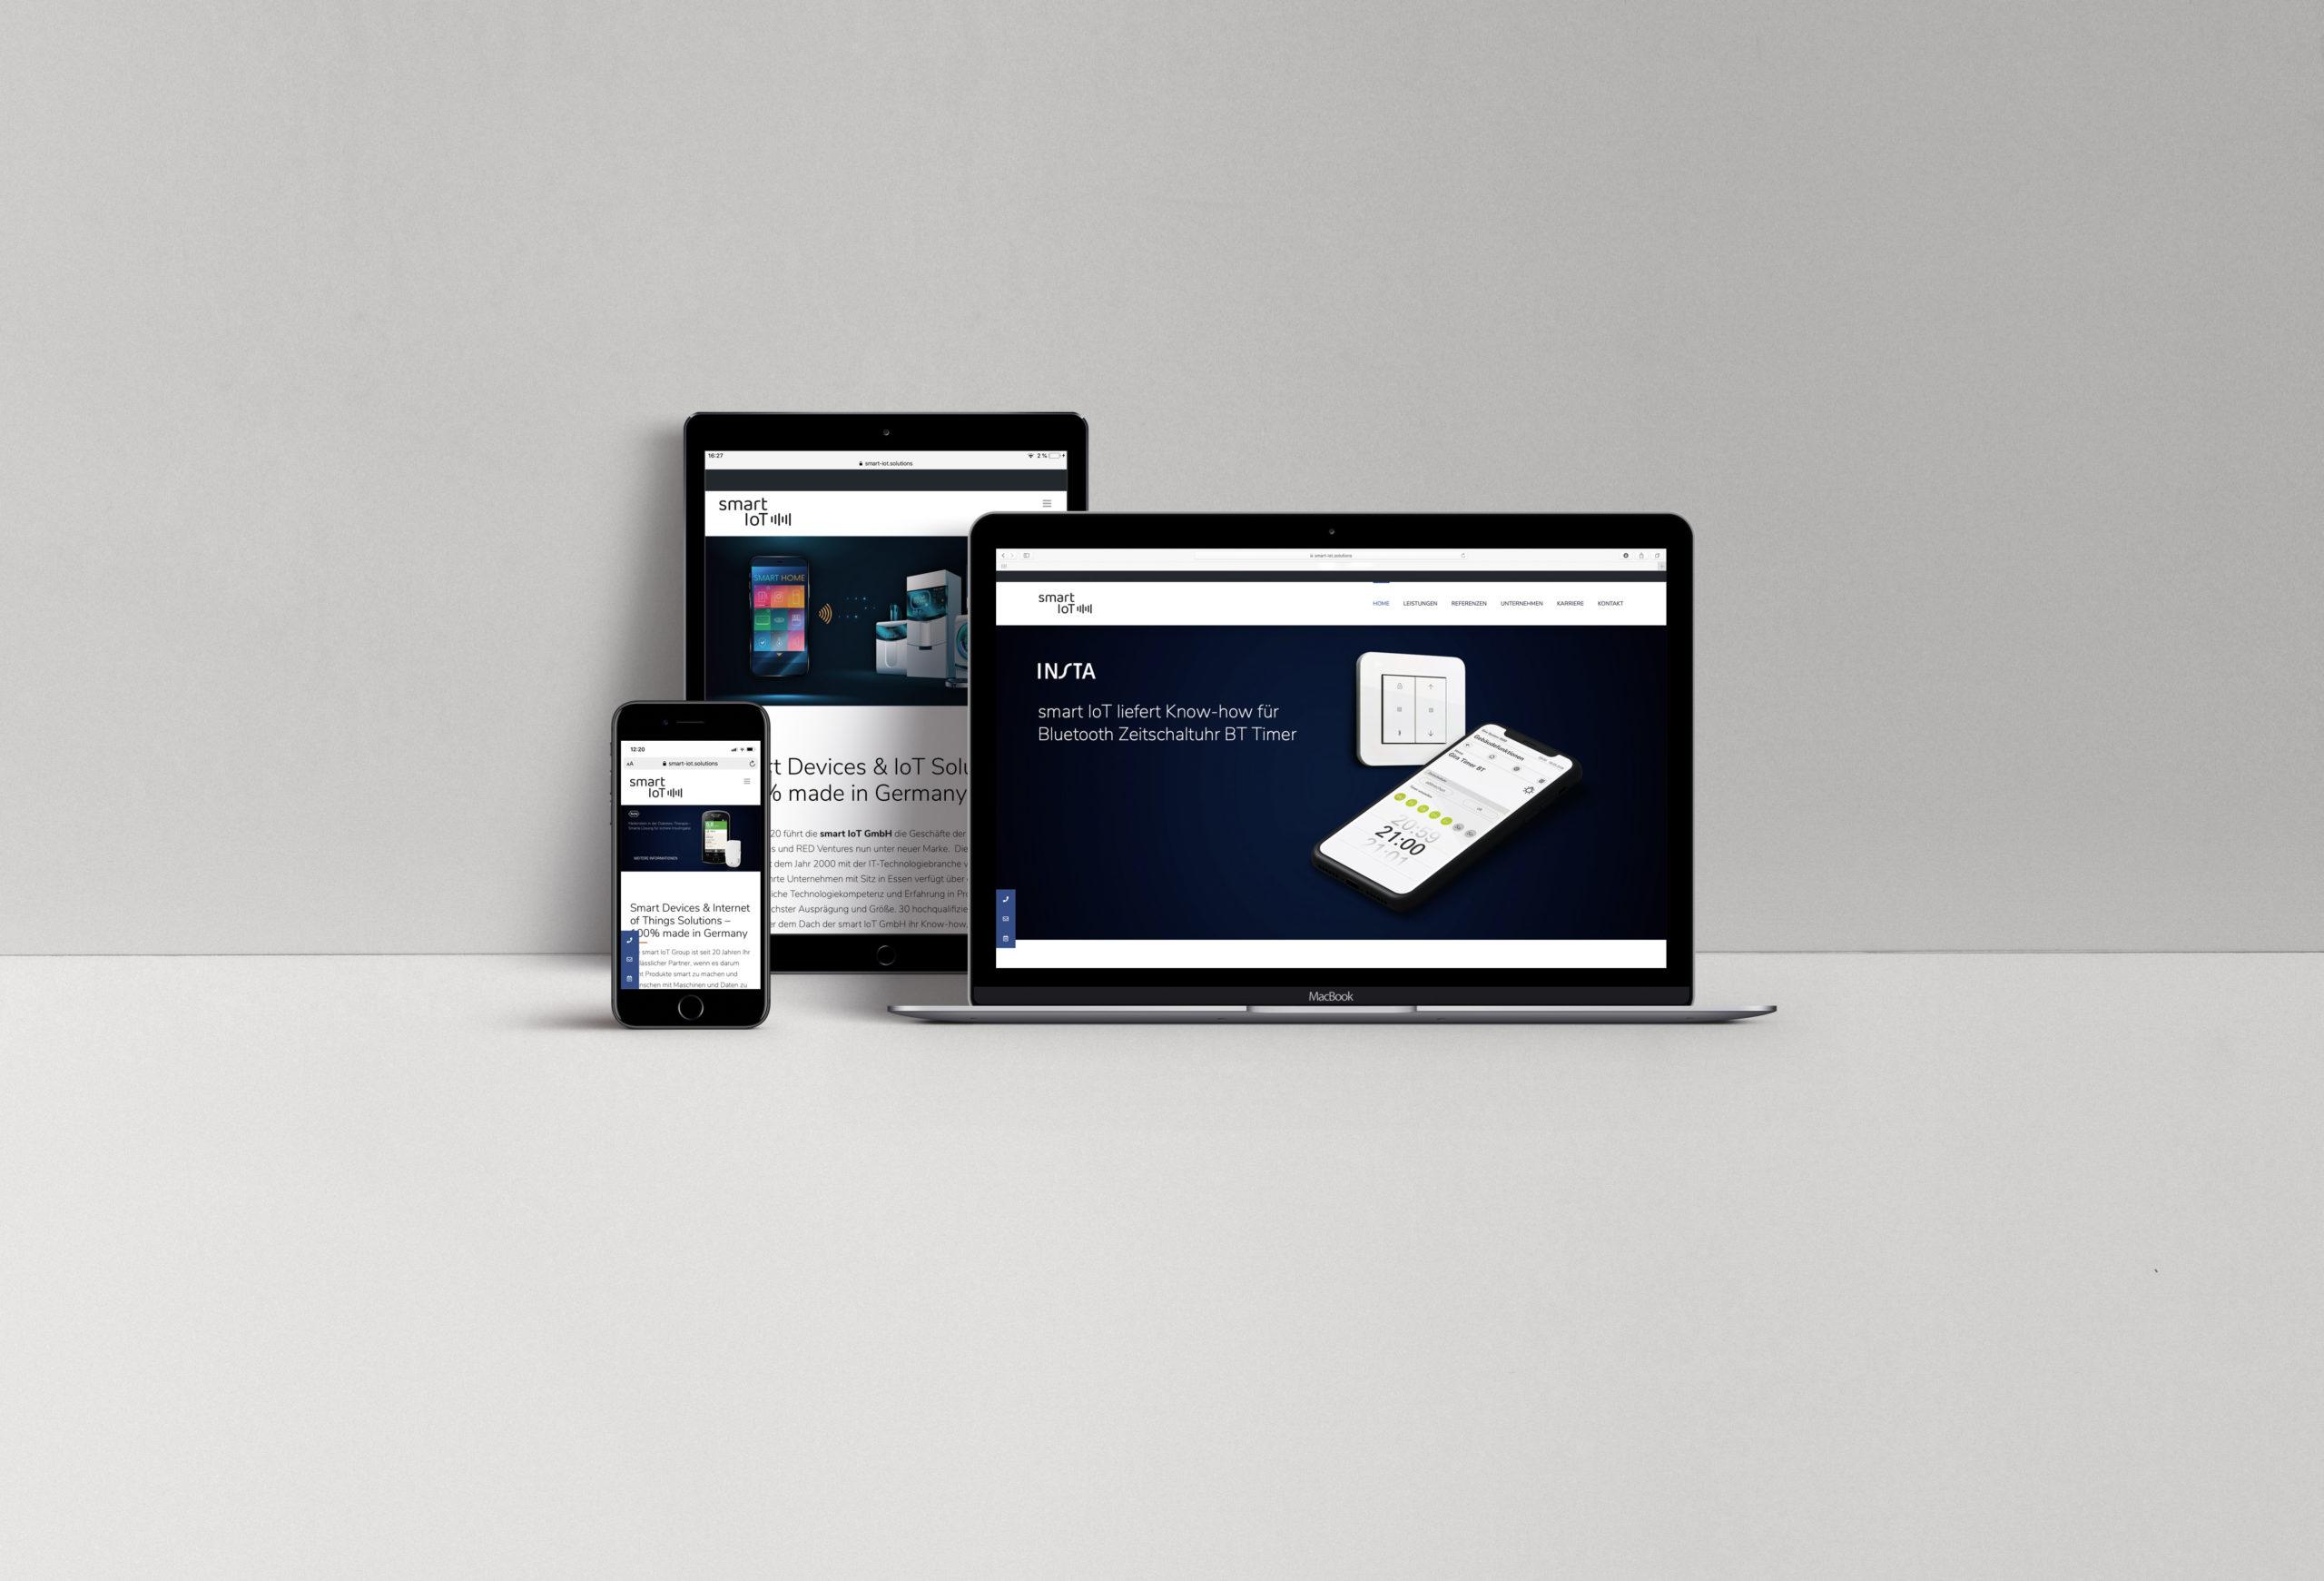 UI/UX Designs smart IoT